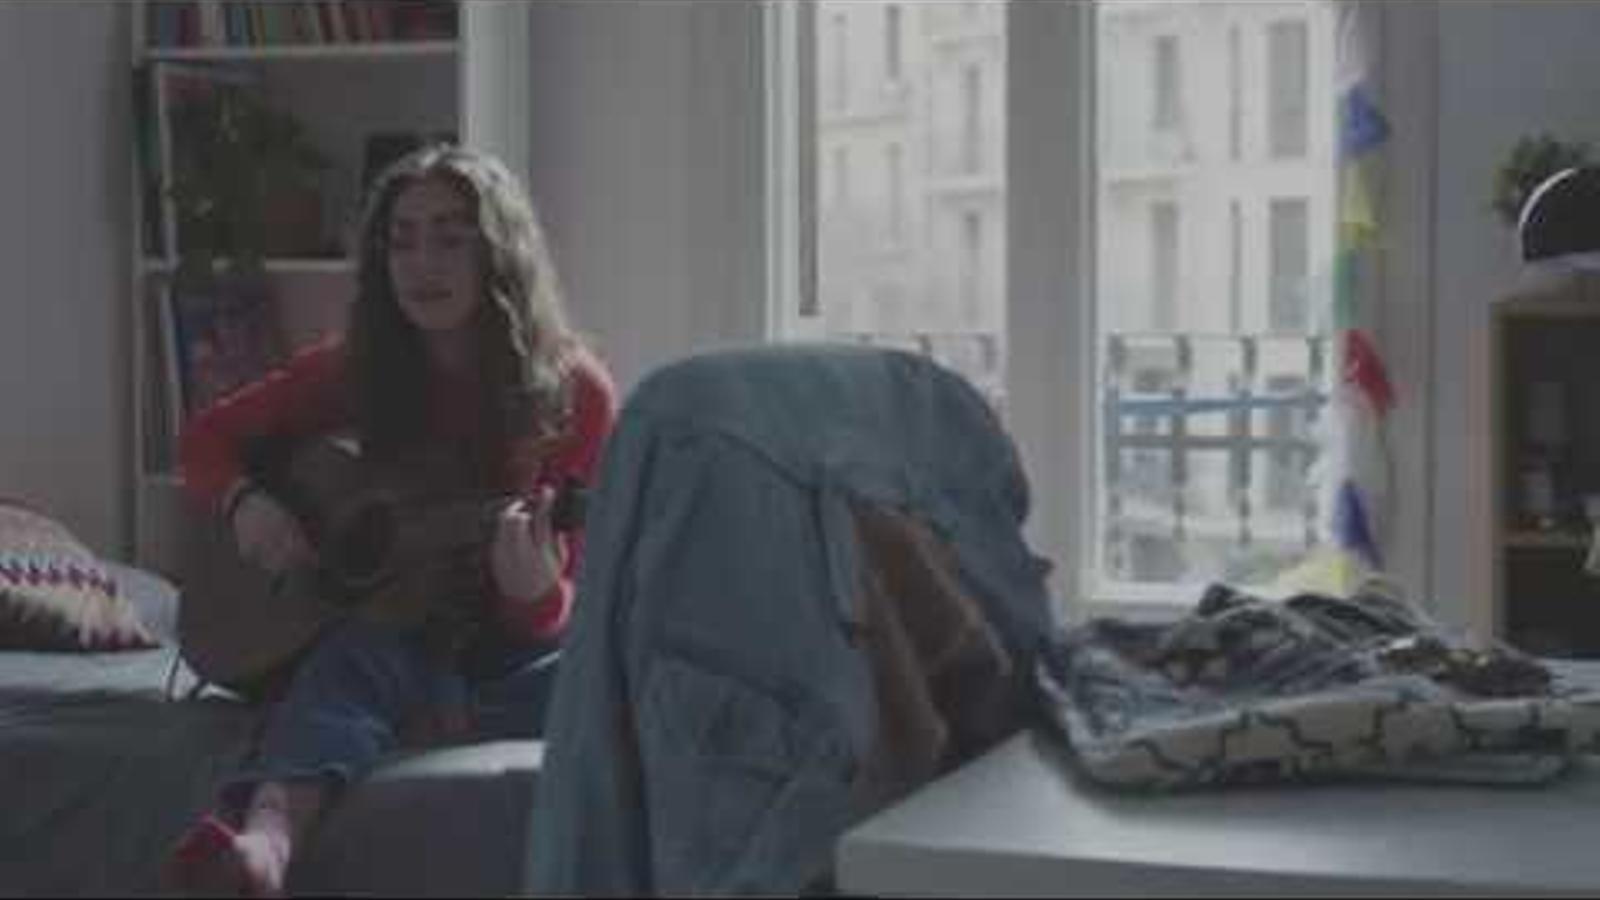 Maria Jaume, 'Autonomia per principiants', videoclip